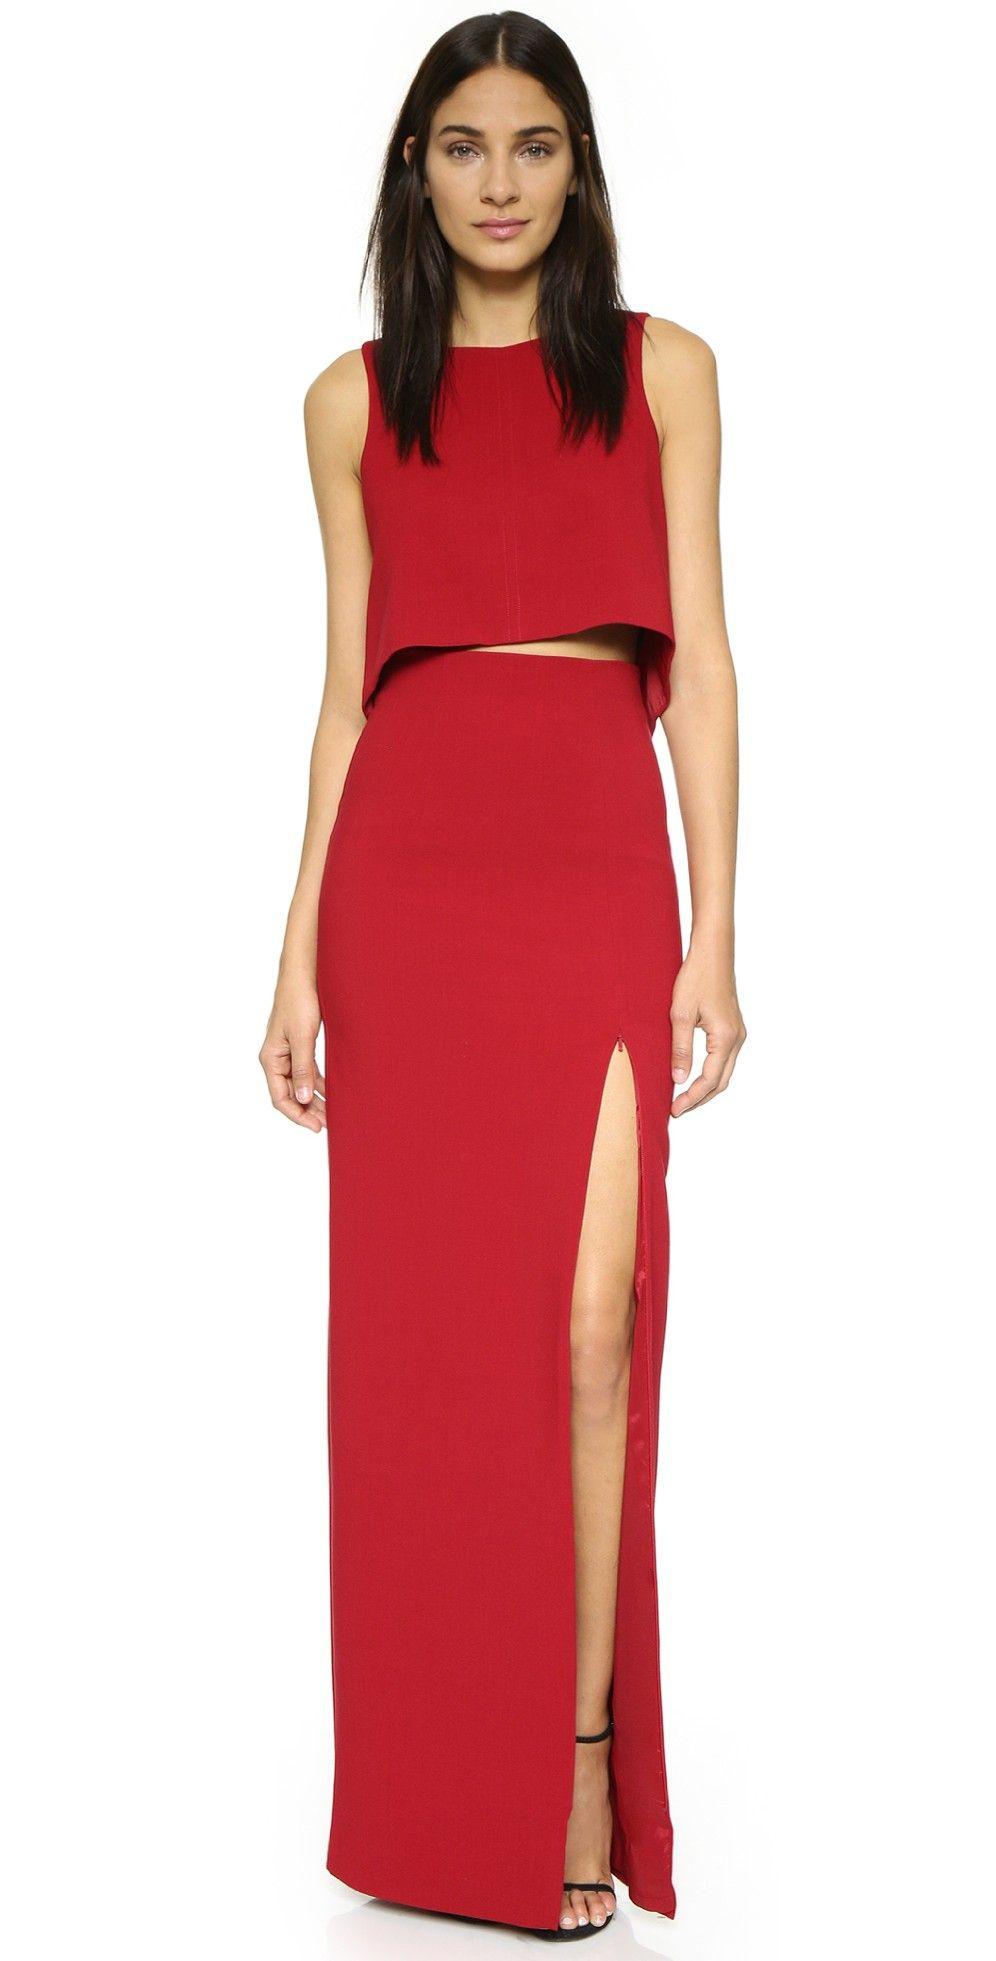 Black Halo Kacie 2 Piece Maxi Dress Maxi Dress Two Piece Red Dress Cocktail Evening Dresses [ 1961 x 996 Pixel ]